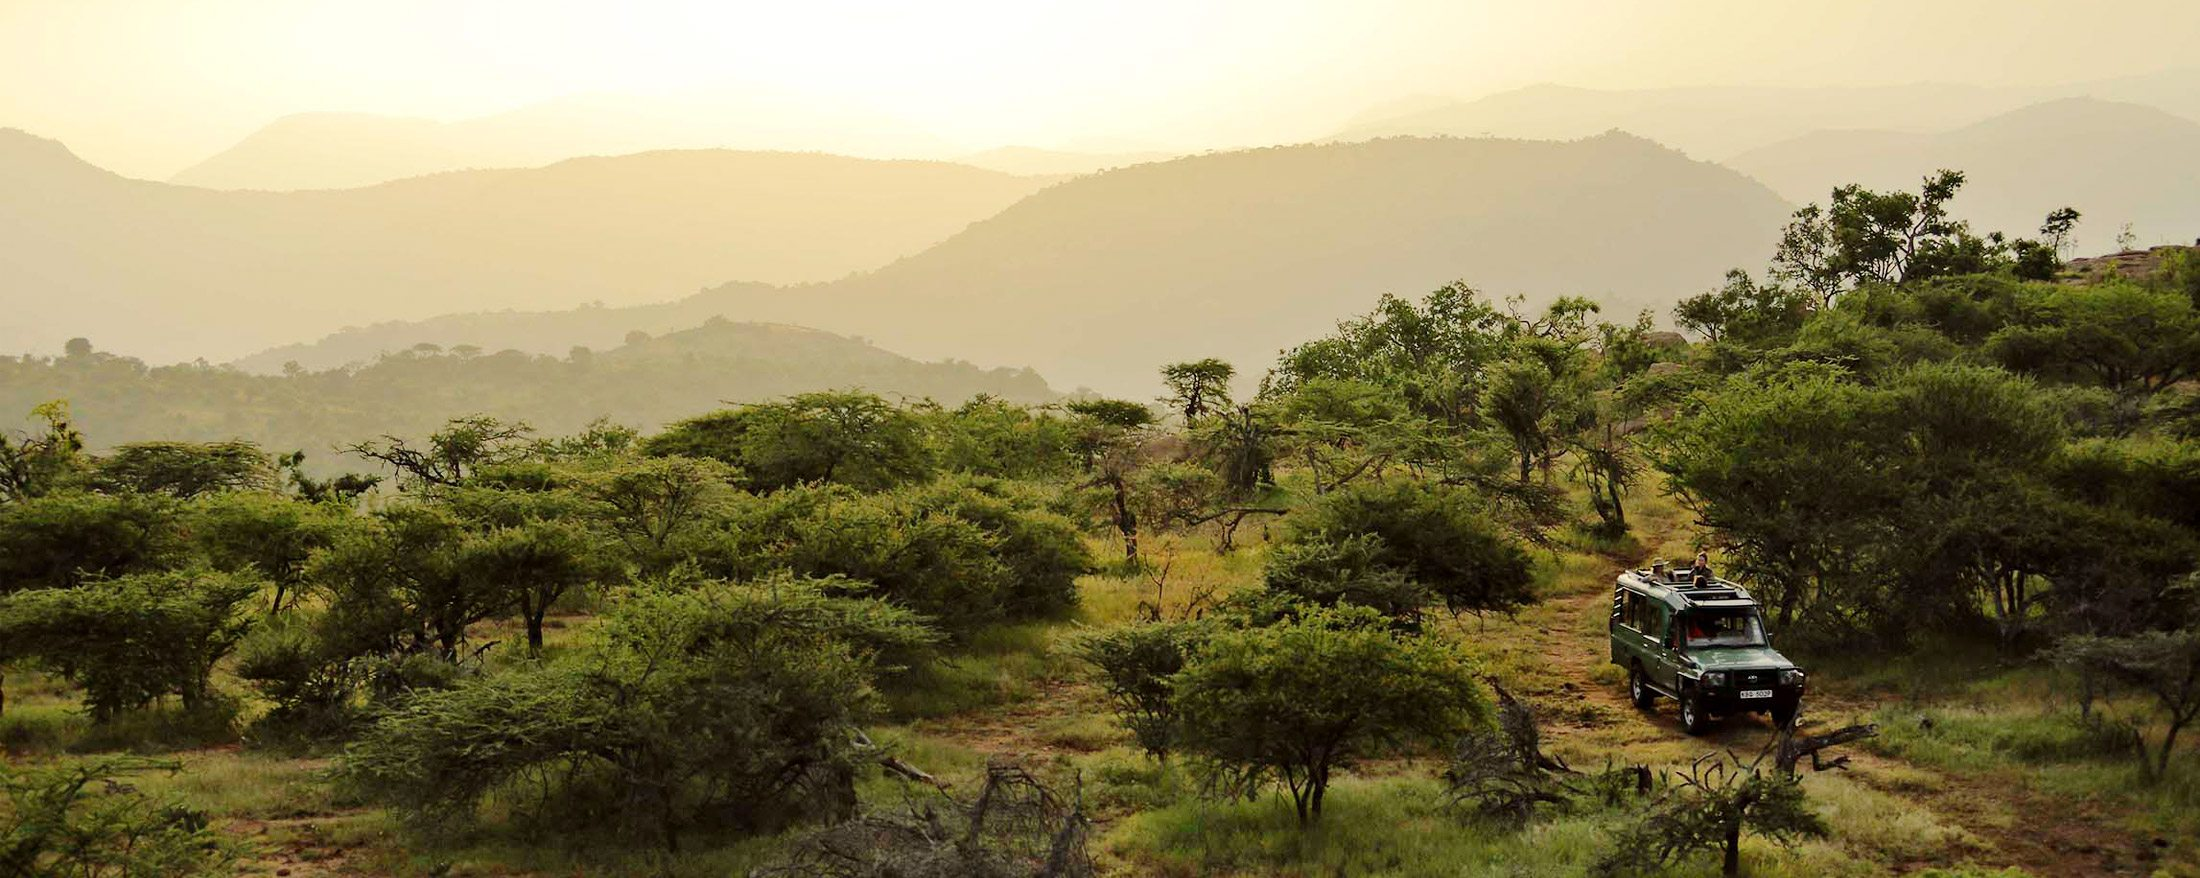 A Laikipia safari offers a truly remote safari experience.